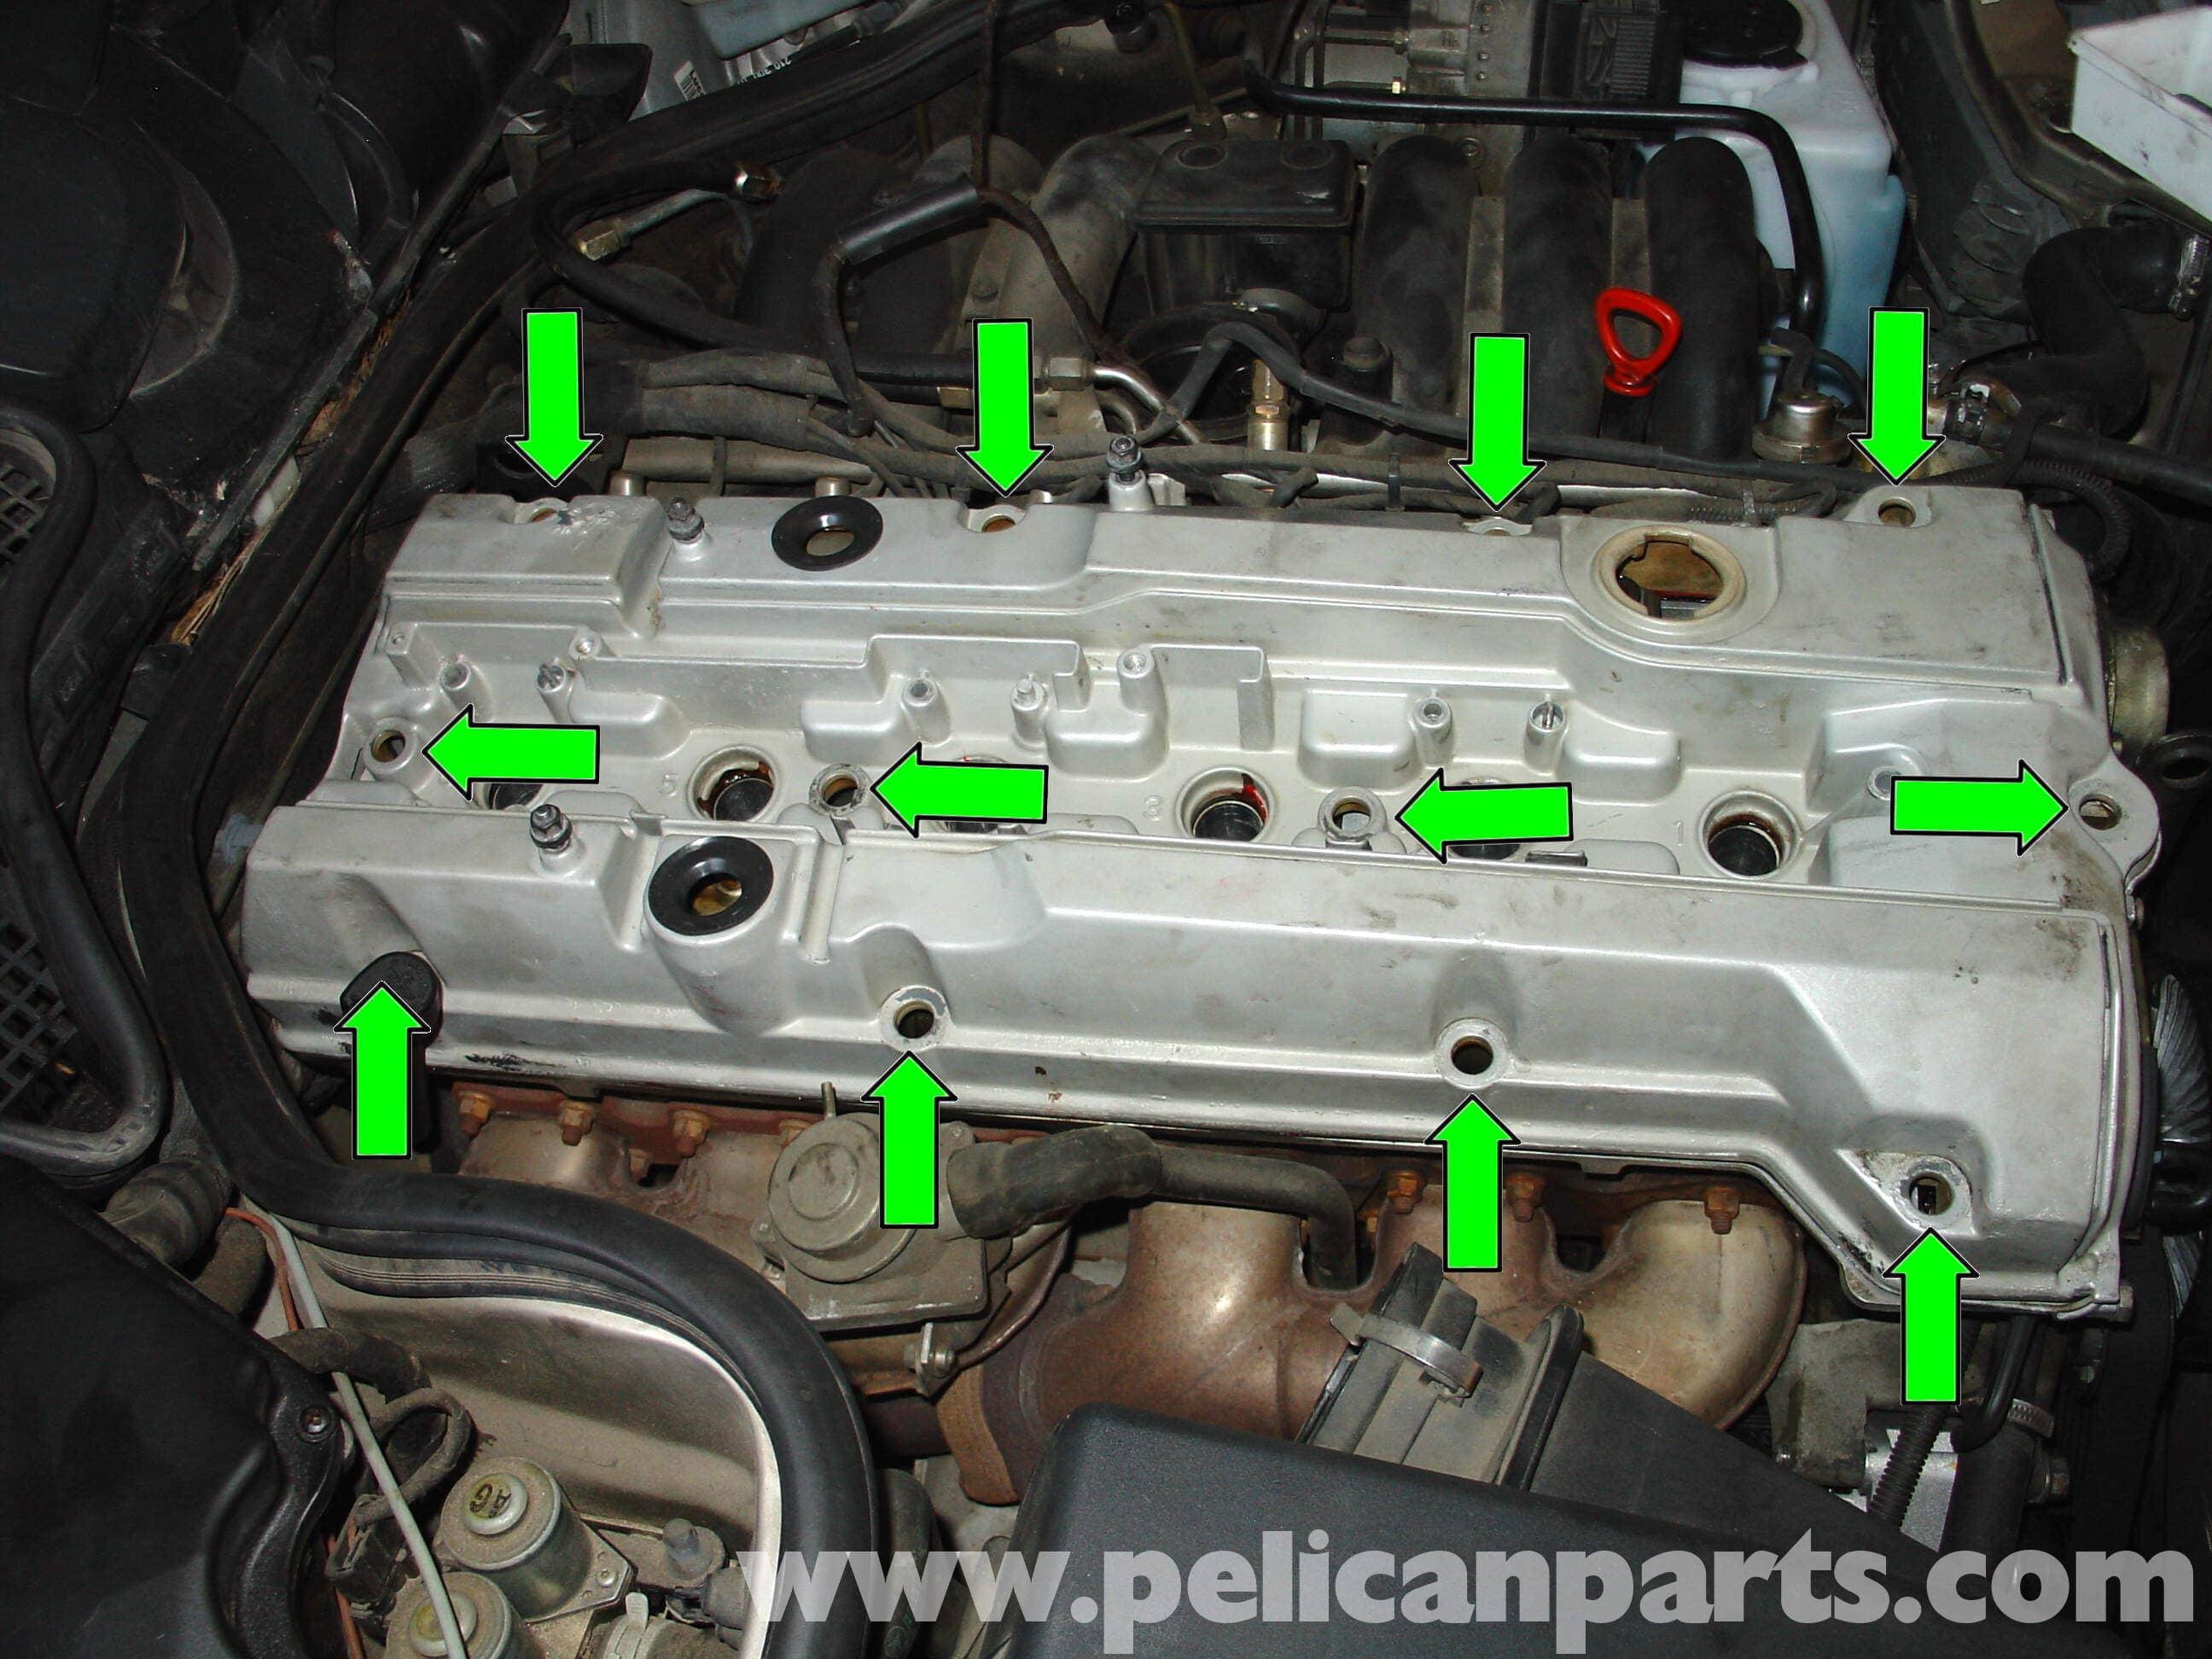 Mercedes-Benz W210 Fixing Common Vacuum Leaks (1996-03) E320, E420